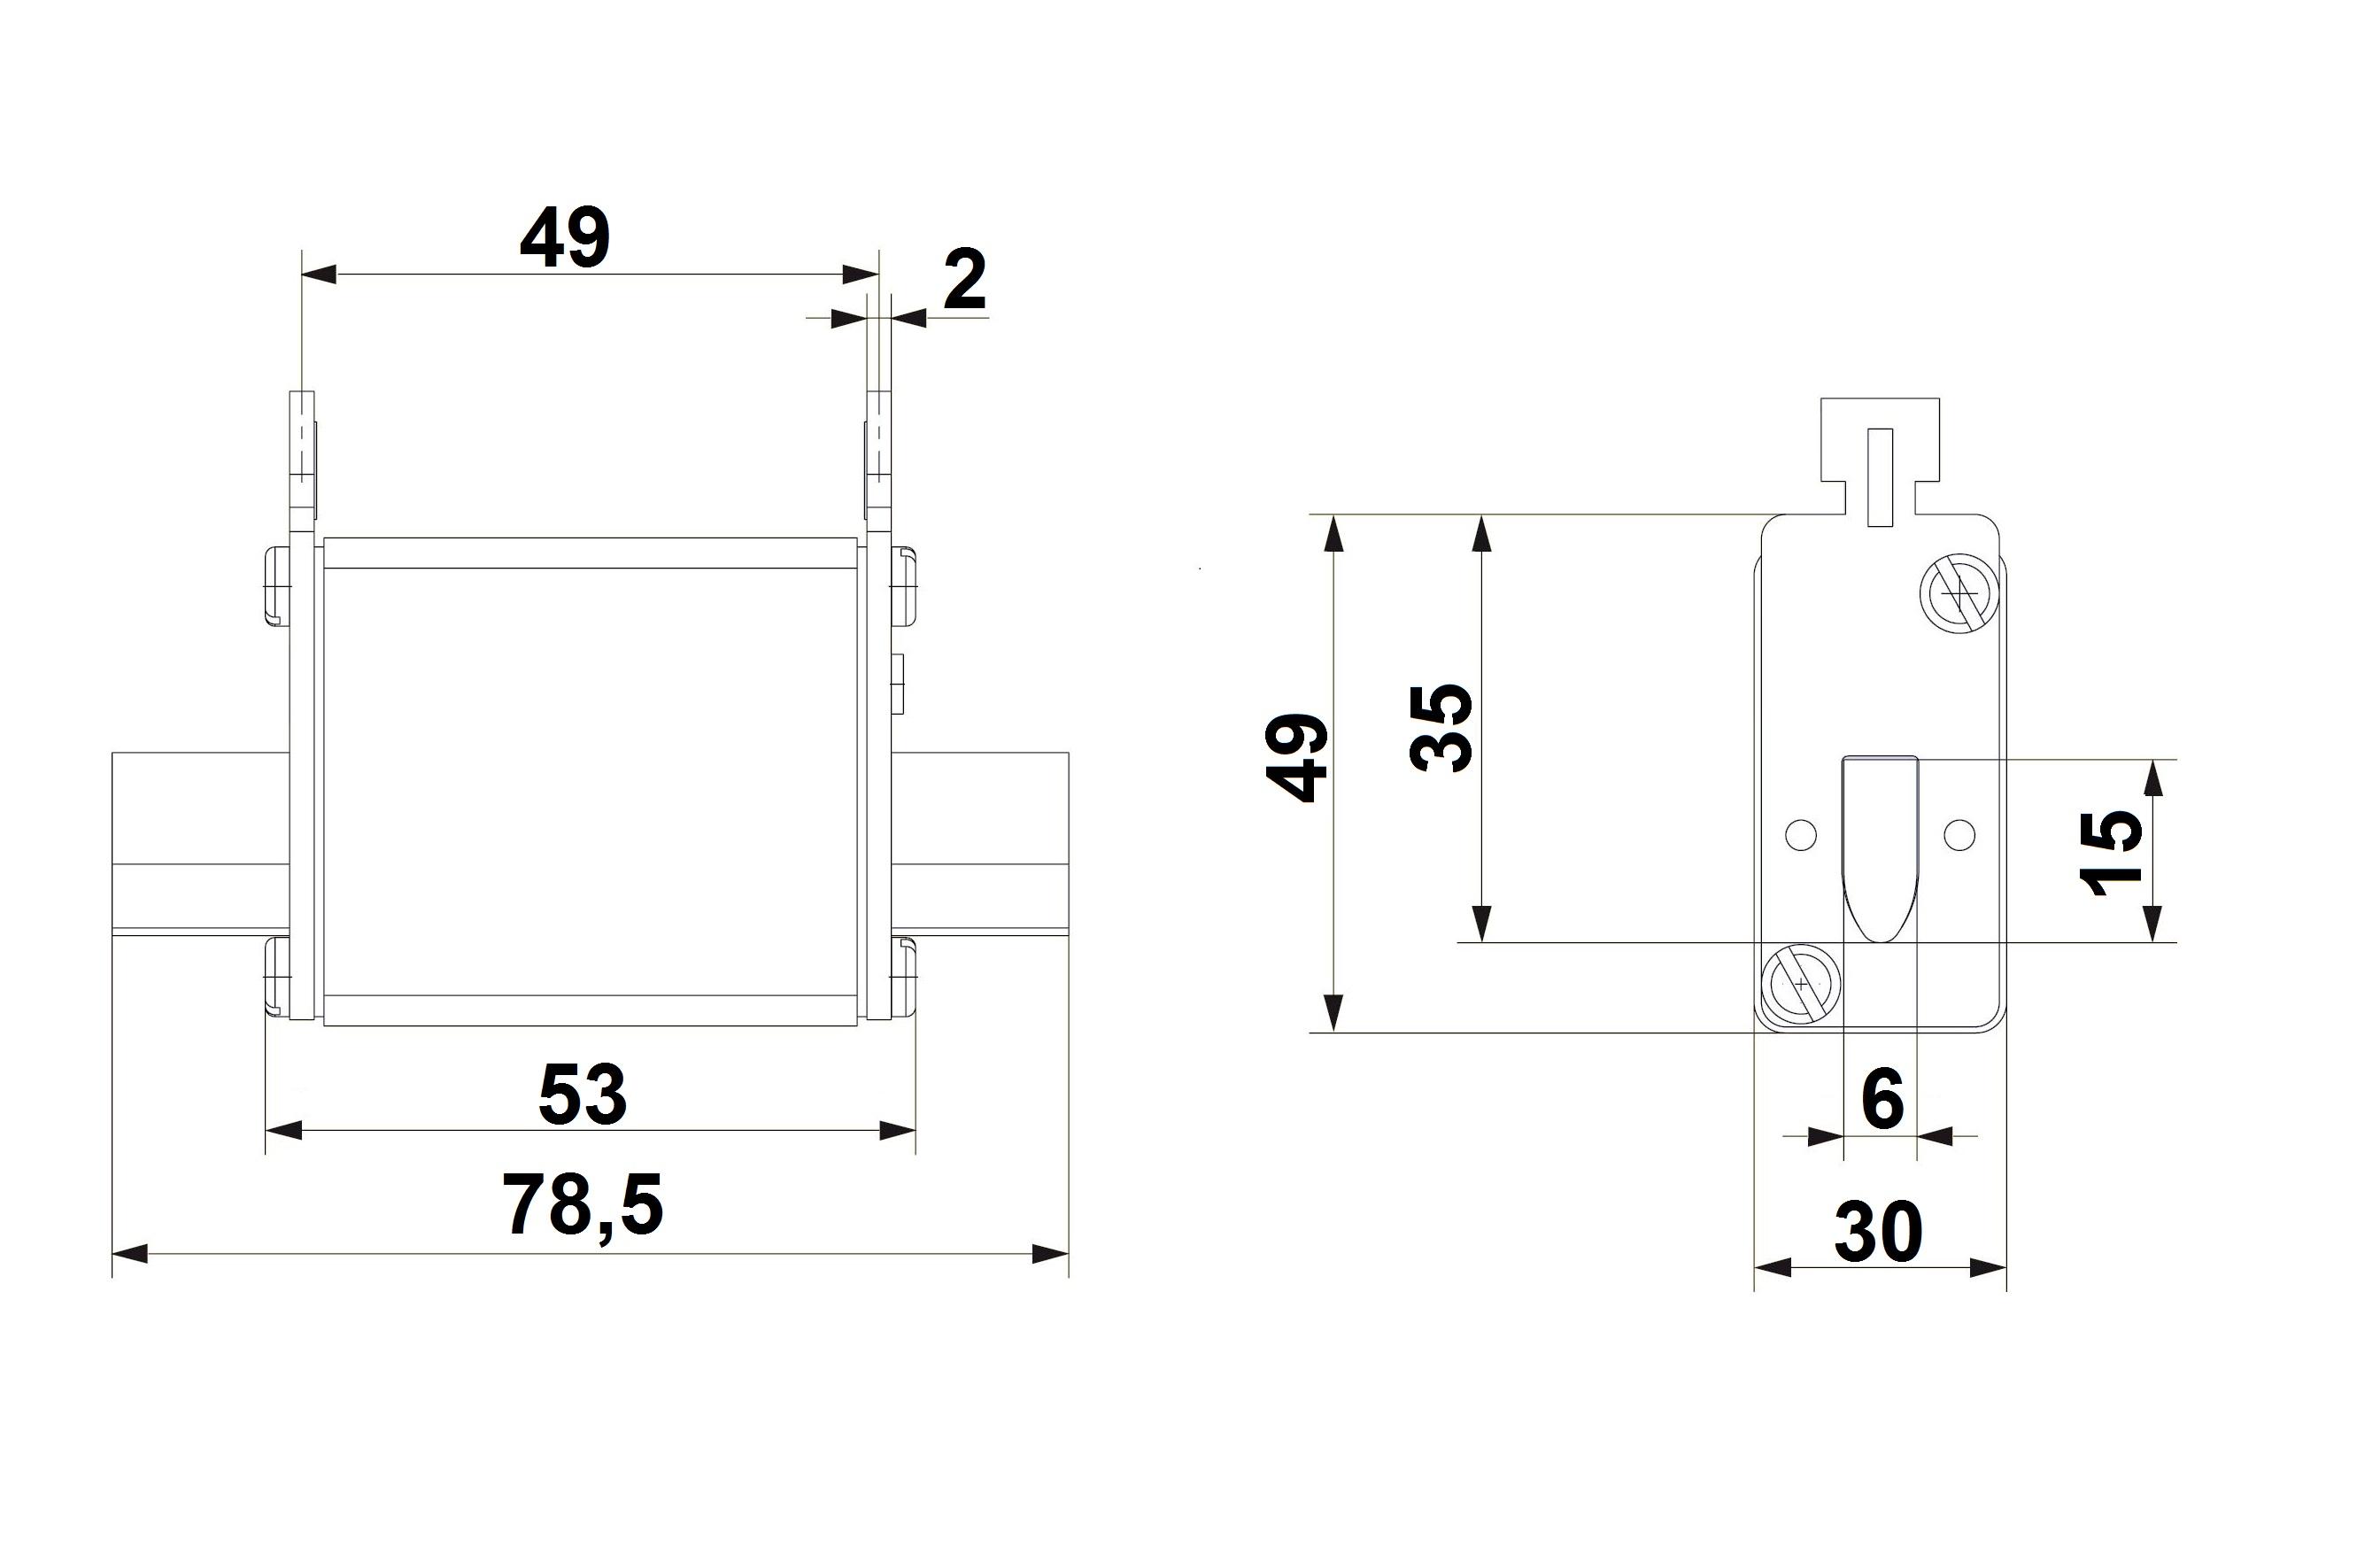 Hrc Fuse Elemt Size 00 160a 400v Ac